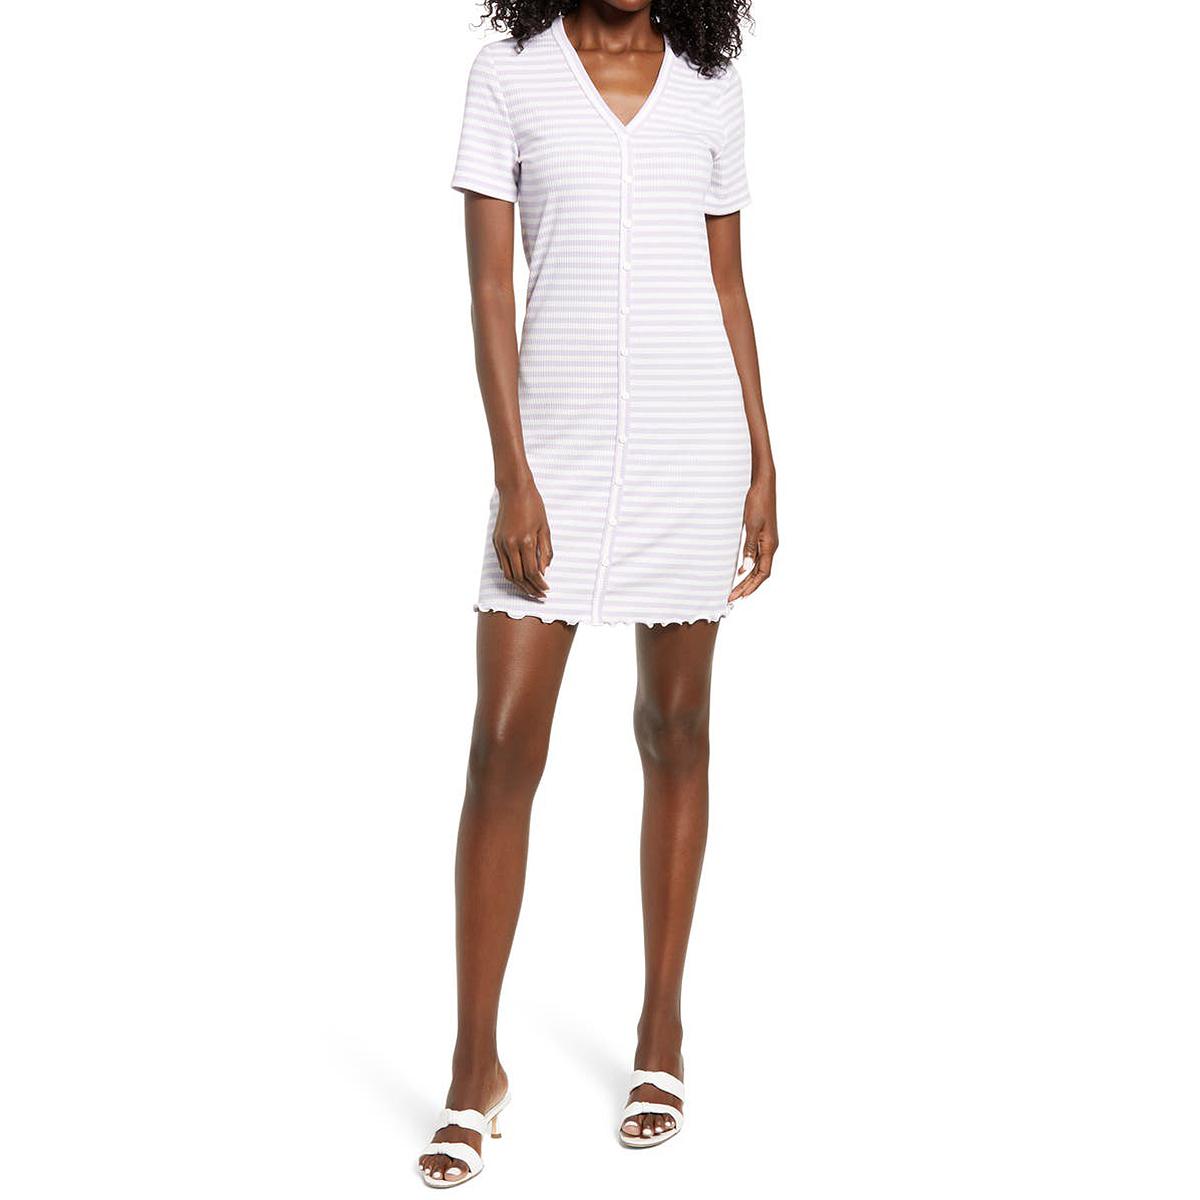 nordstrom-ribbed-clothing-stripe-dress